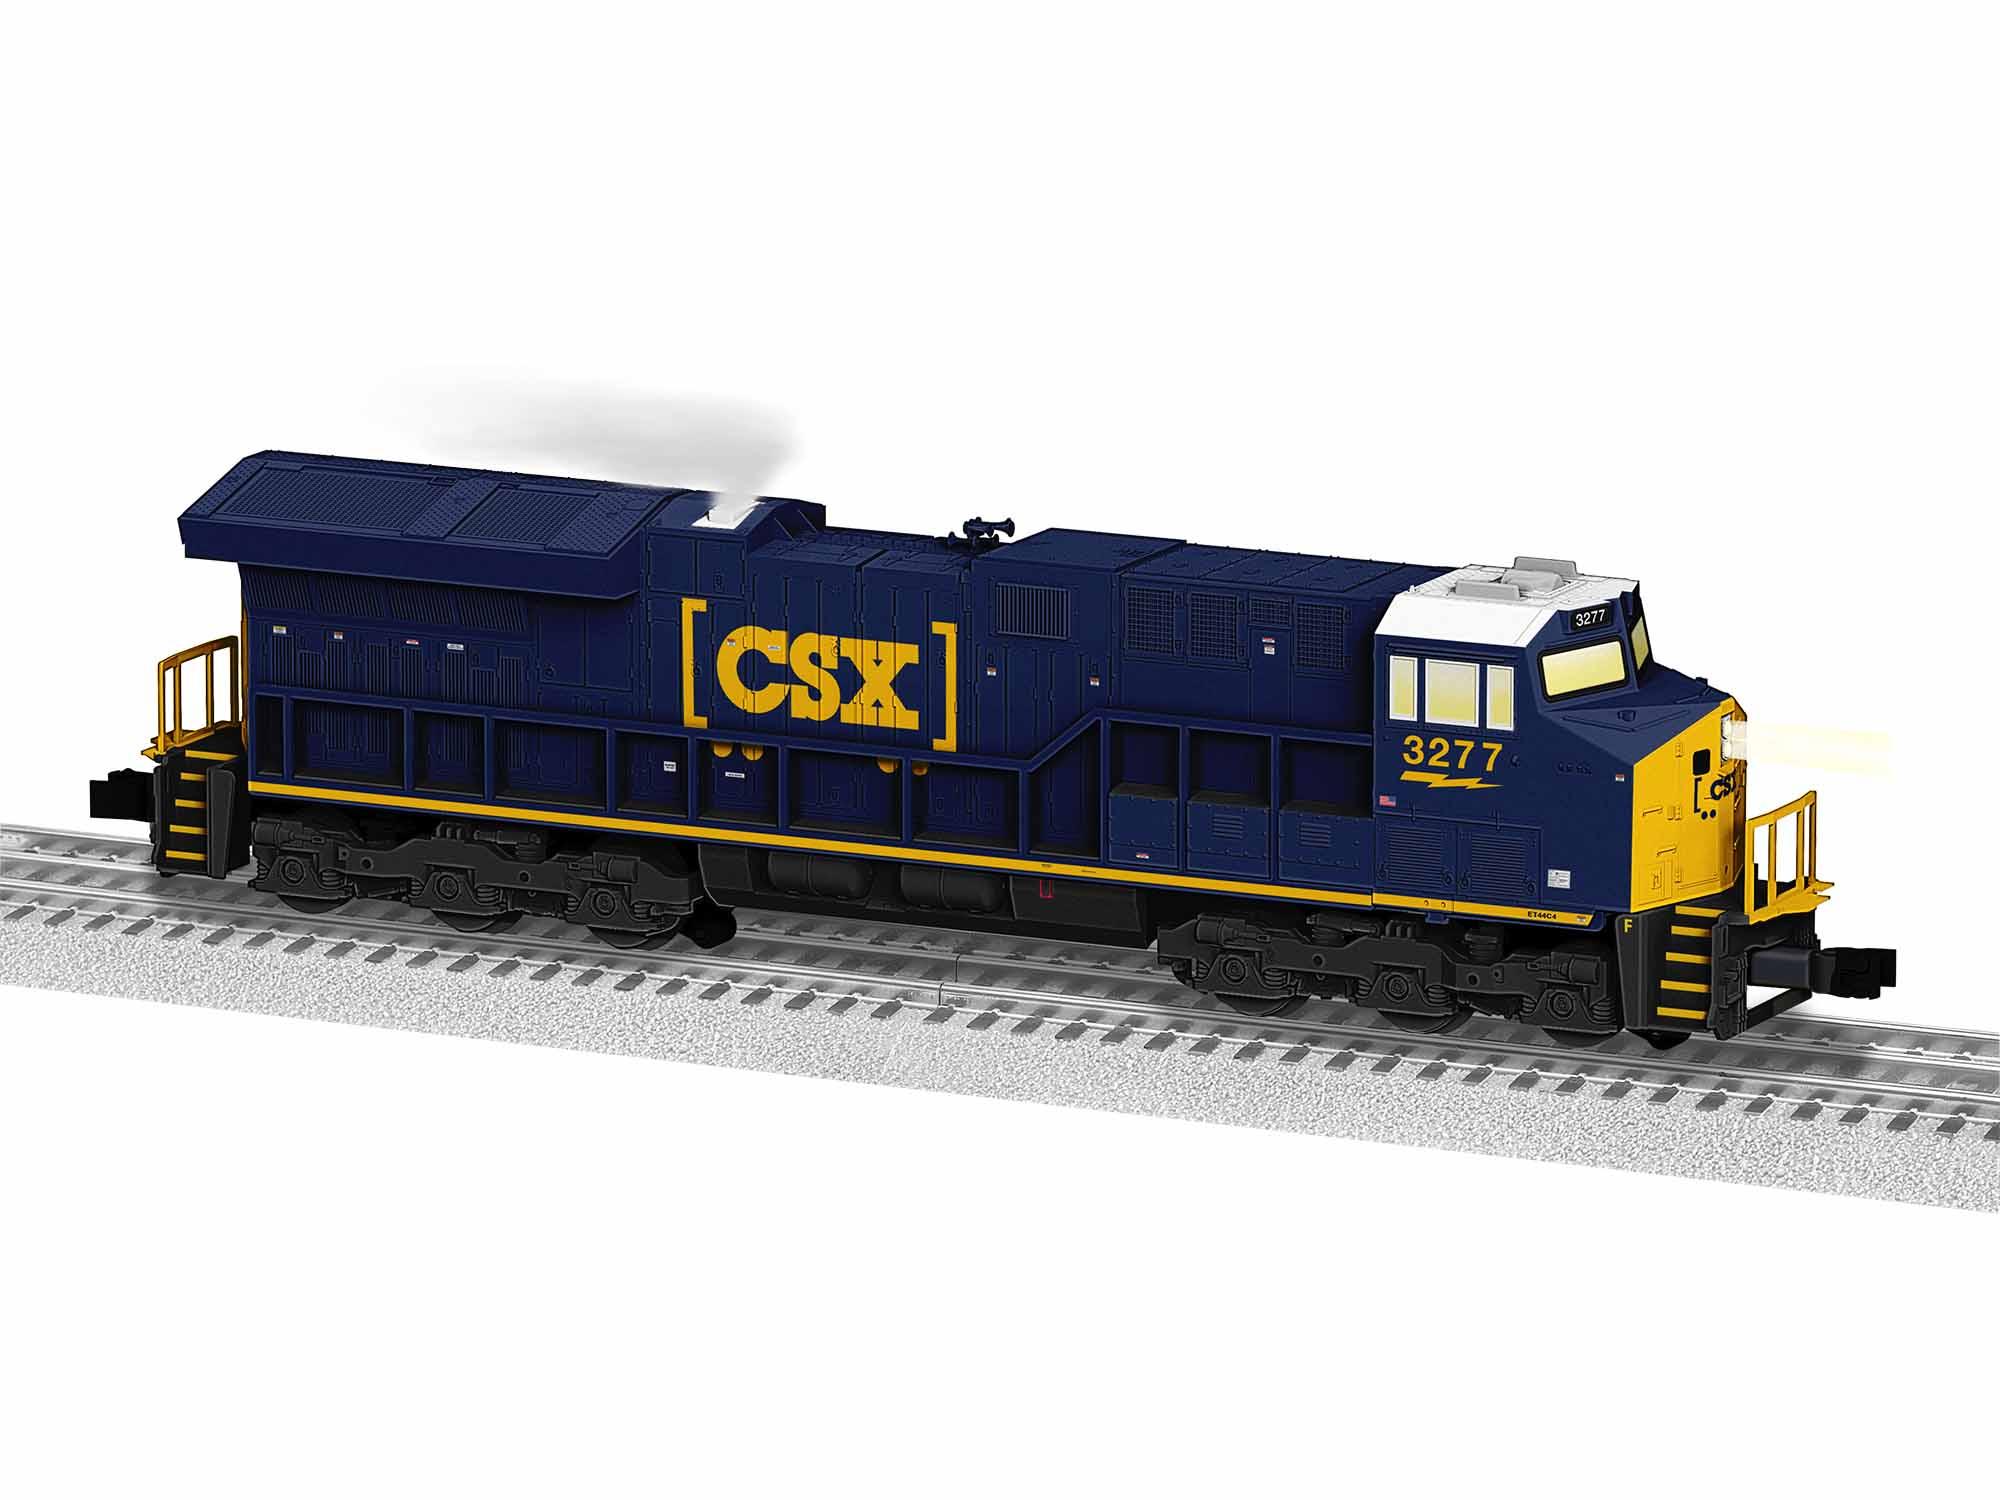 LNL1934021 Lionel O-31 ET44AC, CSX #3277